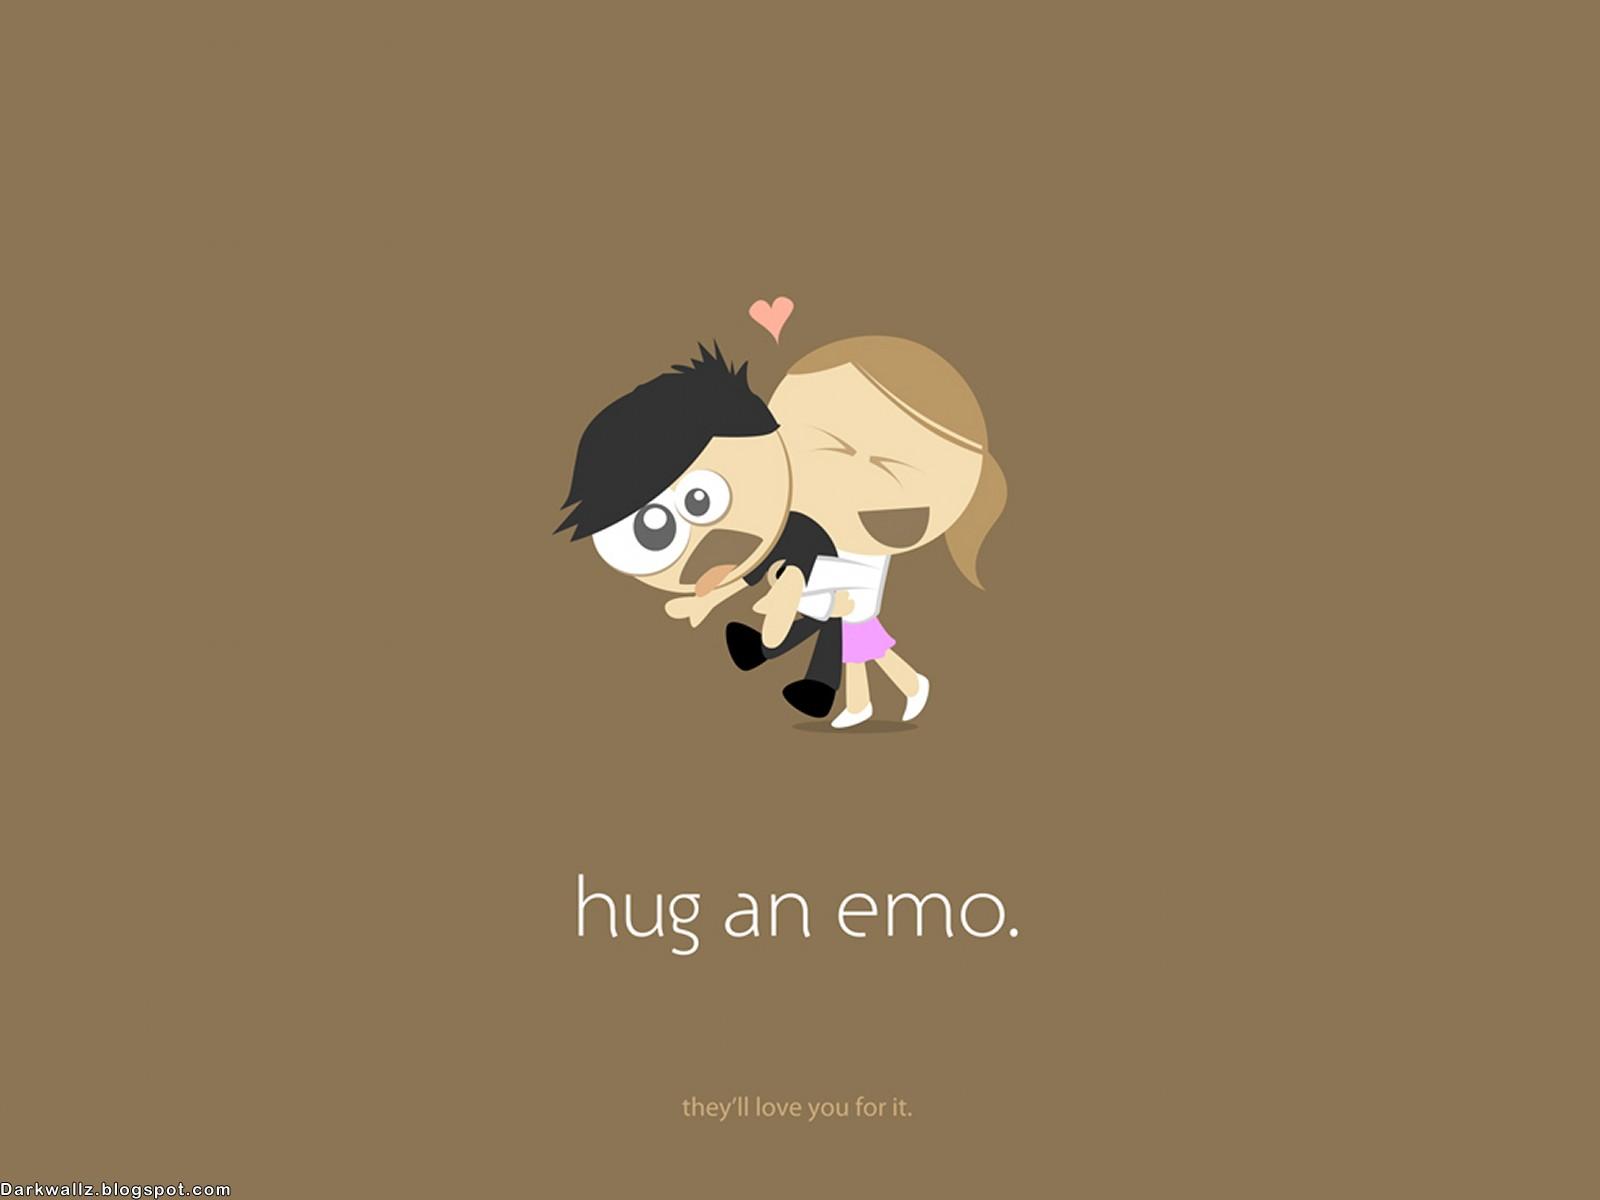 Emo Wallpapers 73| Dark Wallpaper Download